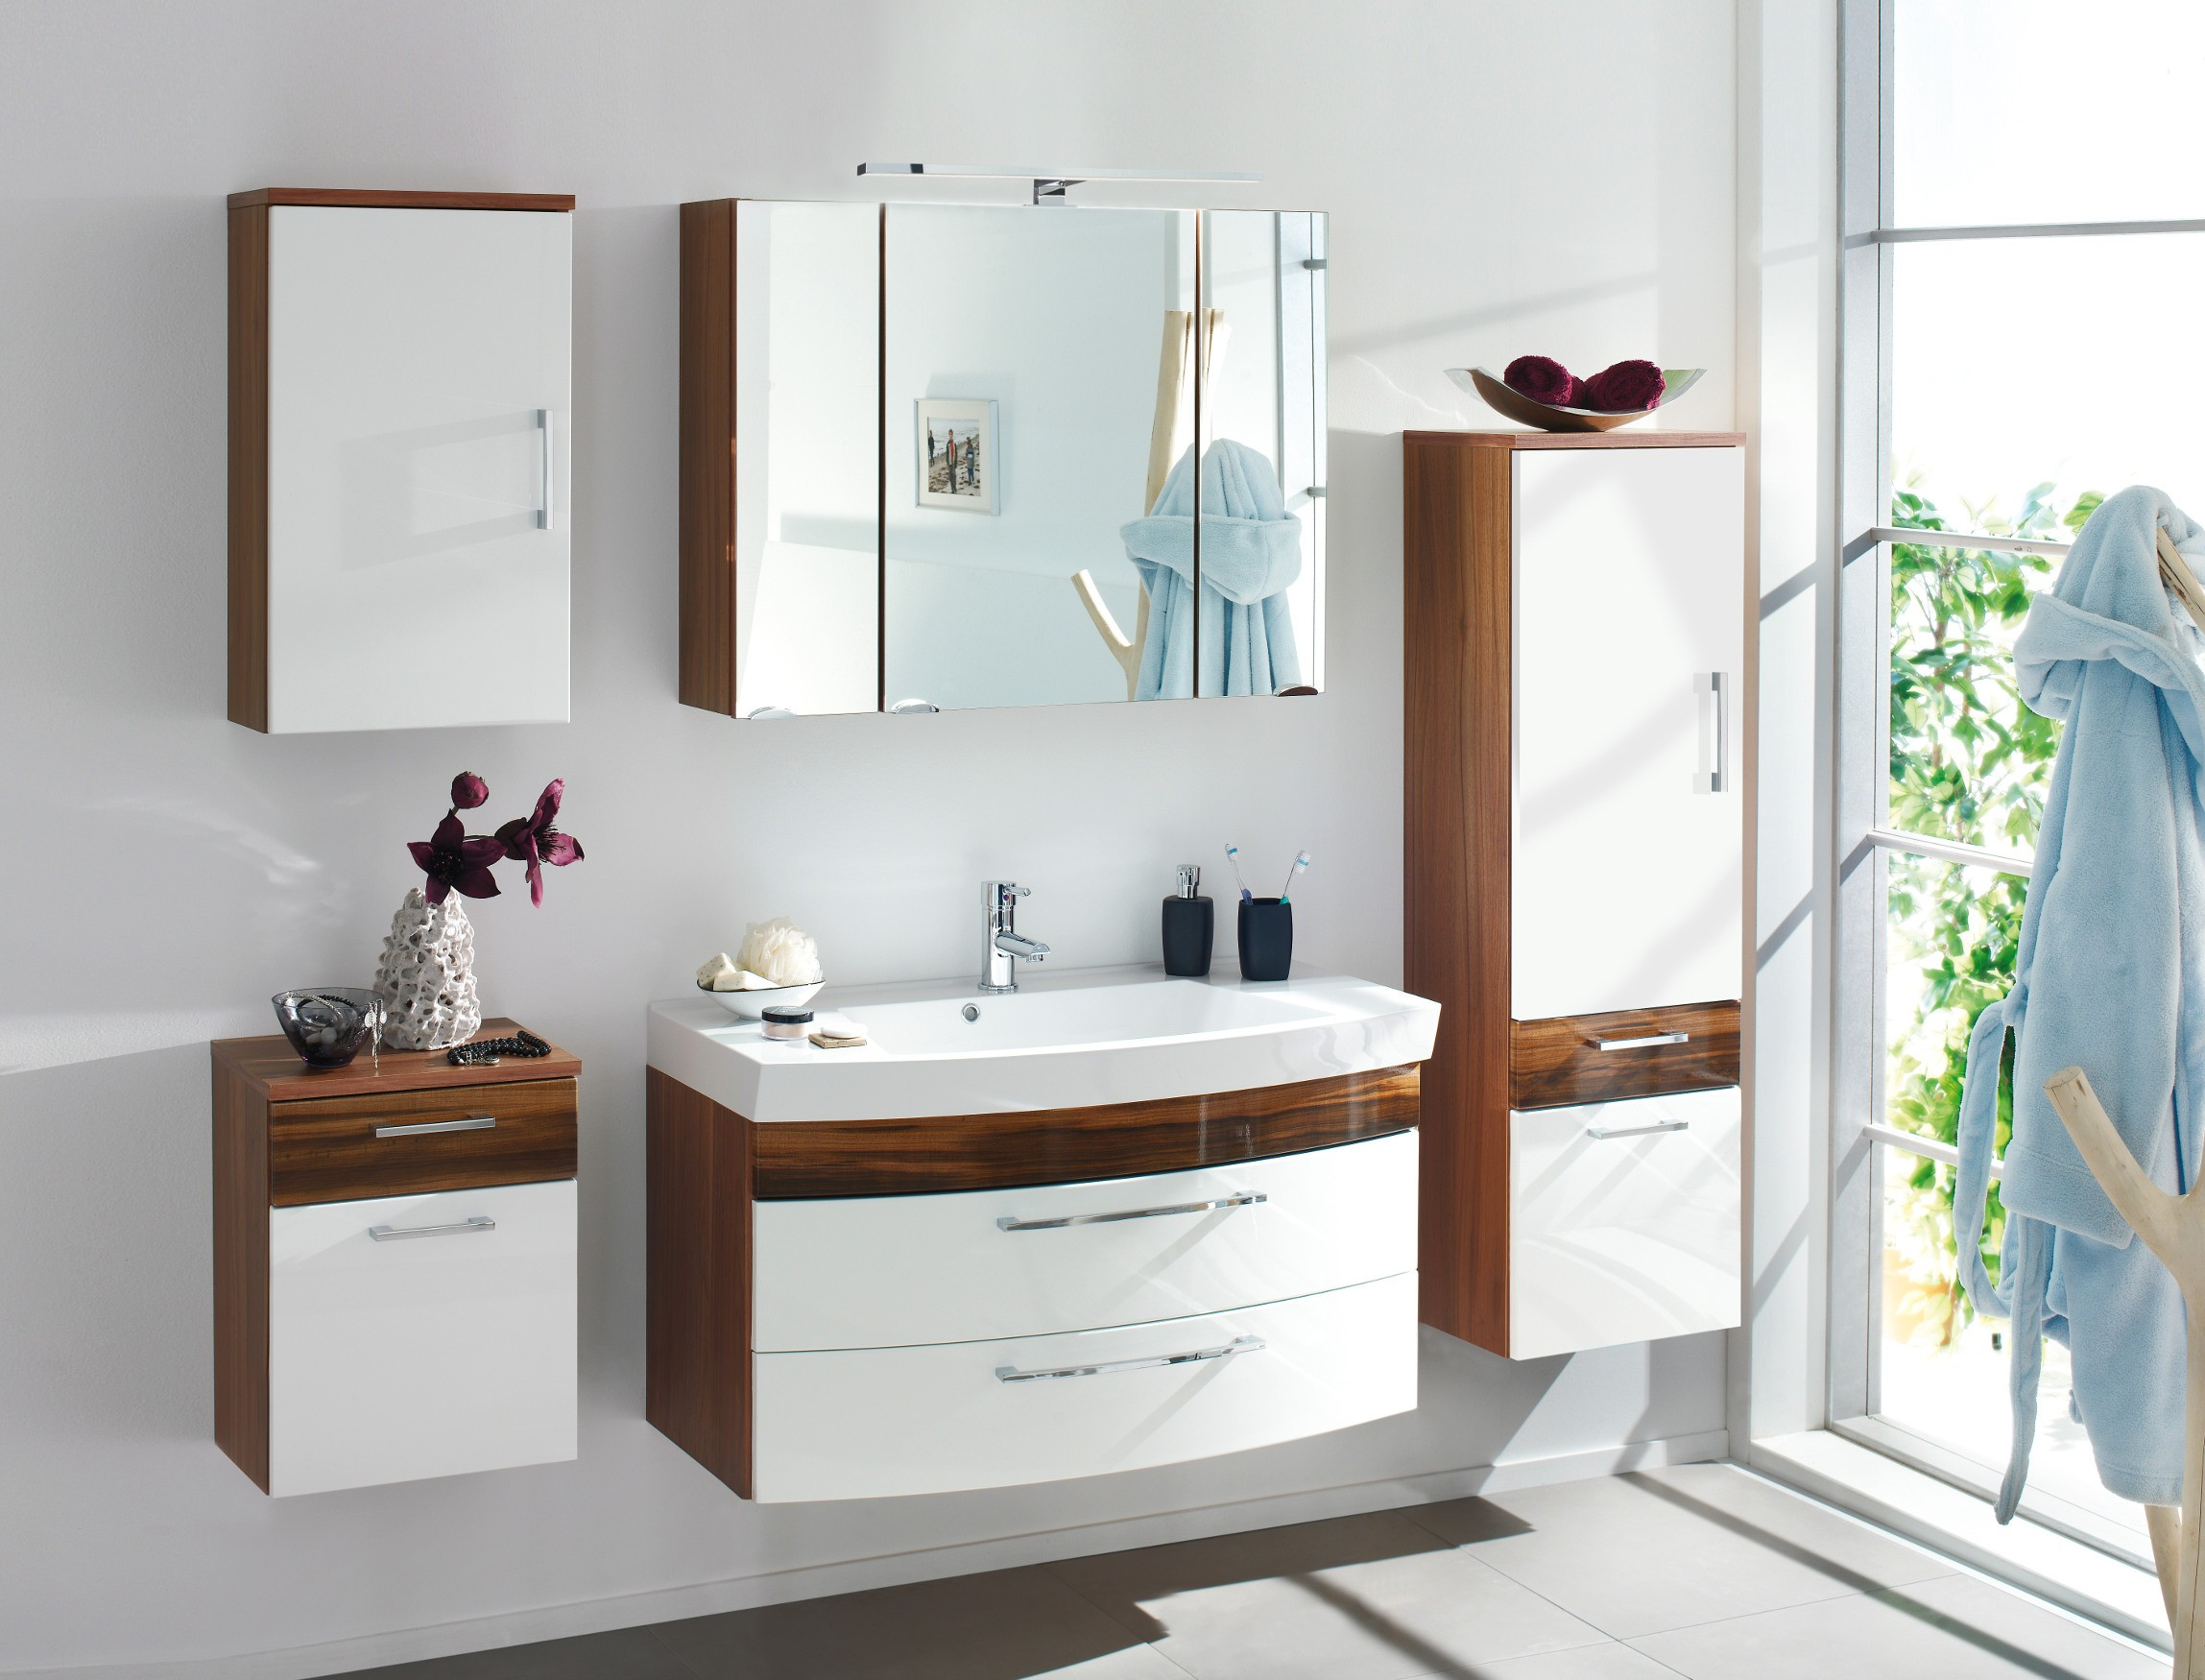 badm bel set rima i mit waschtisch 7 teilig 180 cm breit wei walnuss bad badm belsets. Black Bedroom Furniture Sets. Home Design Ideas